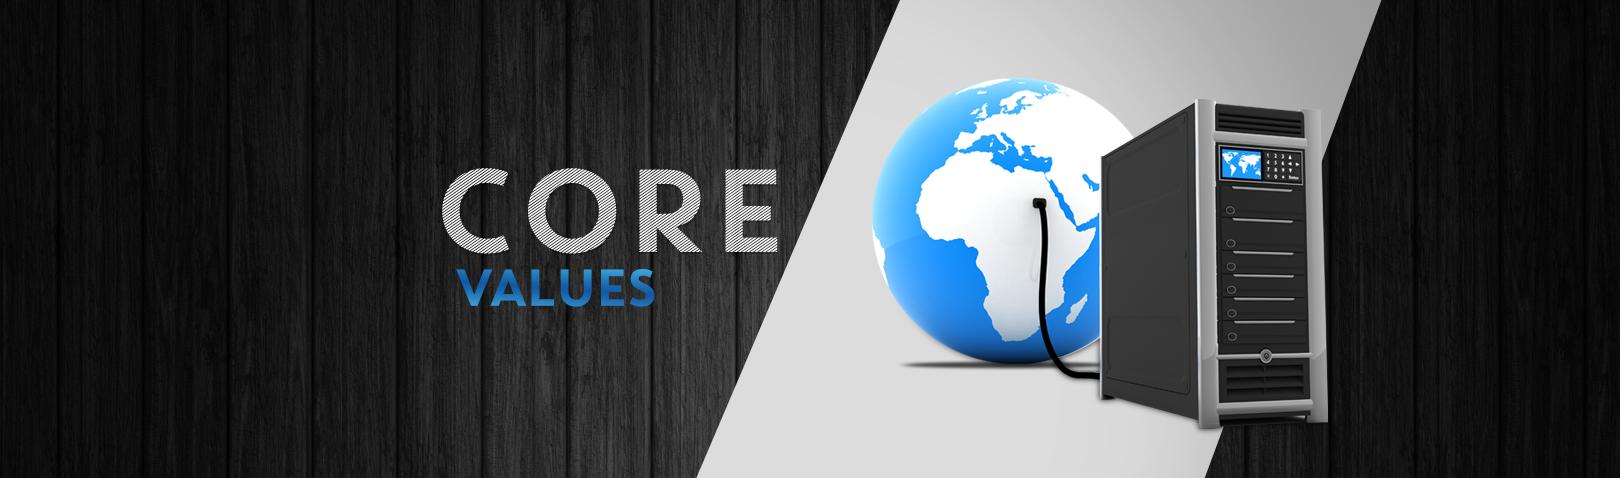 core_value_banner